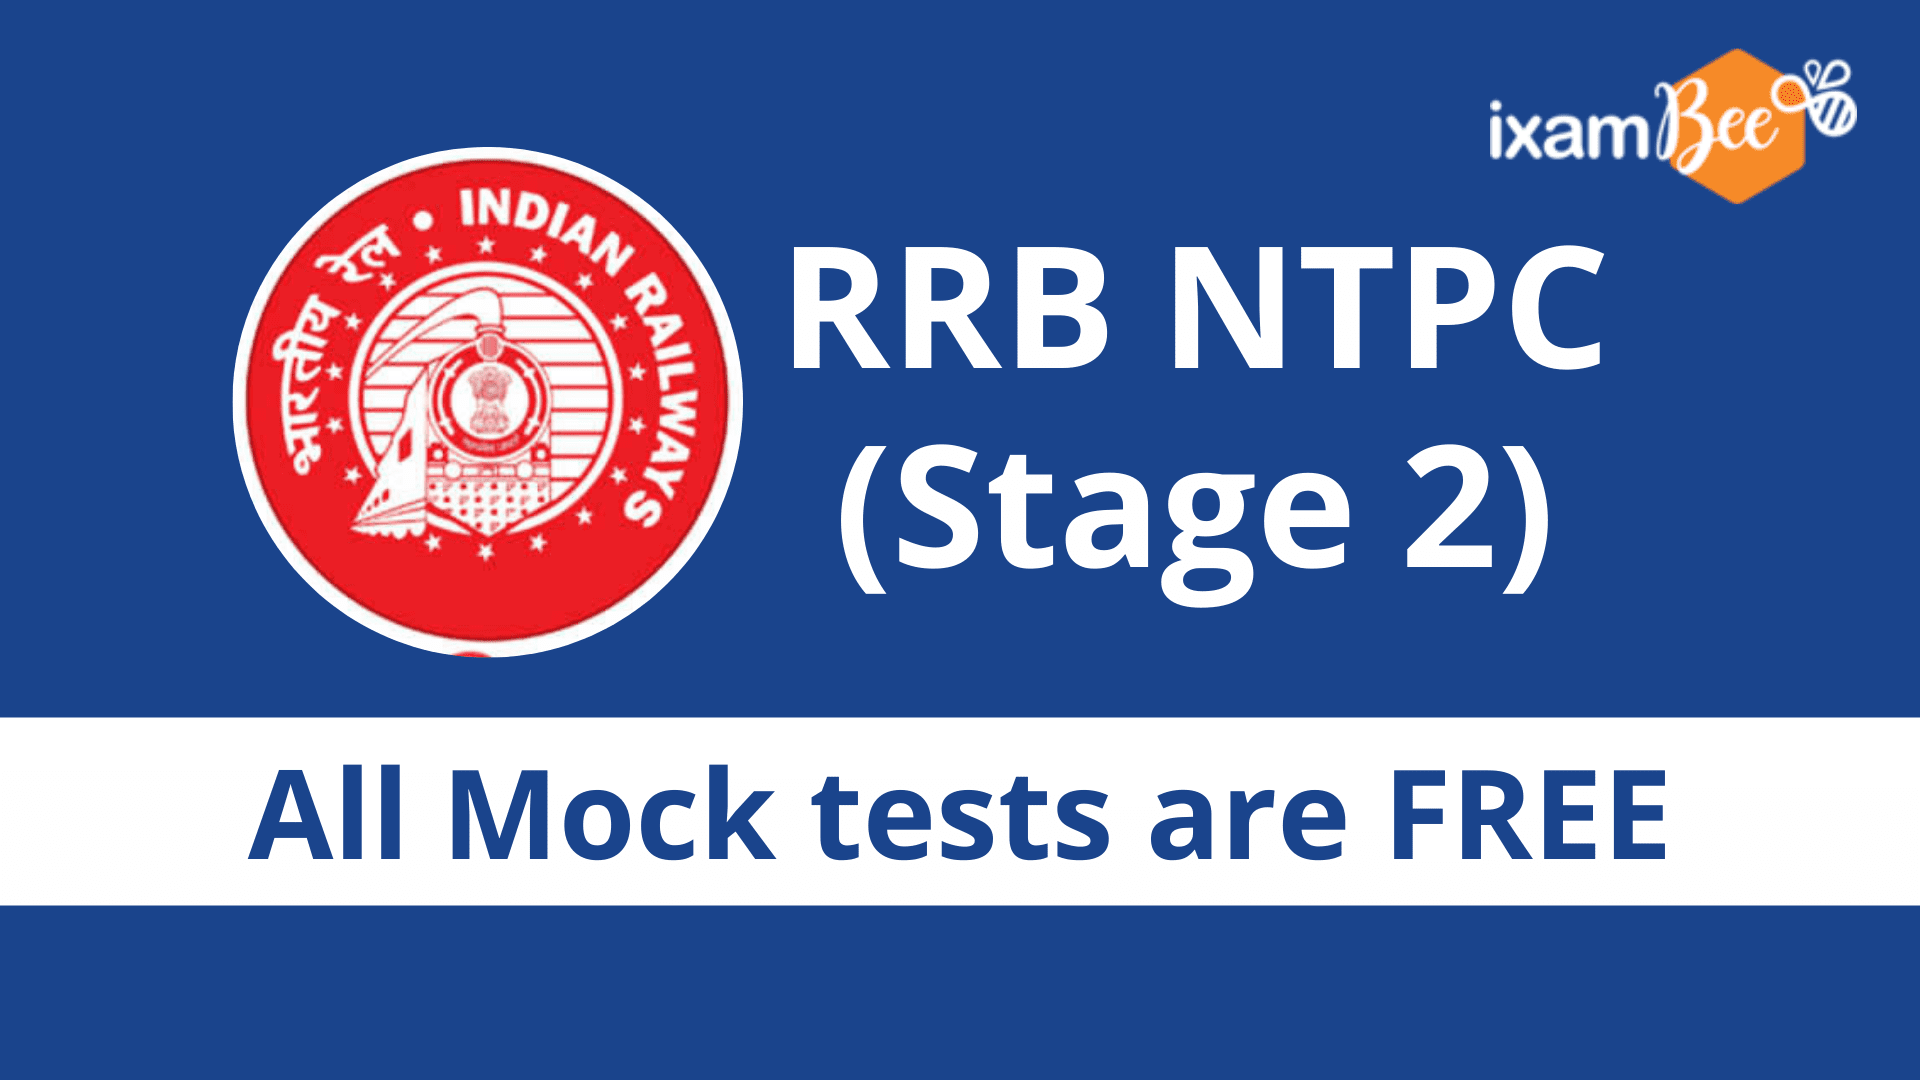 RRB NTPC Stage 2 Free Mock Test